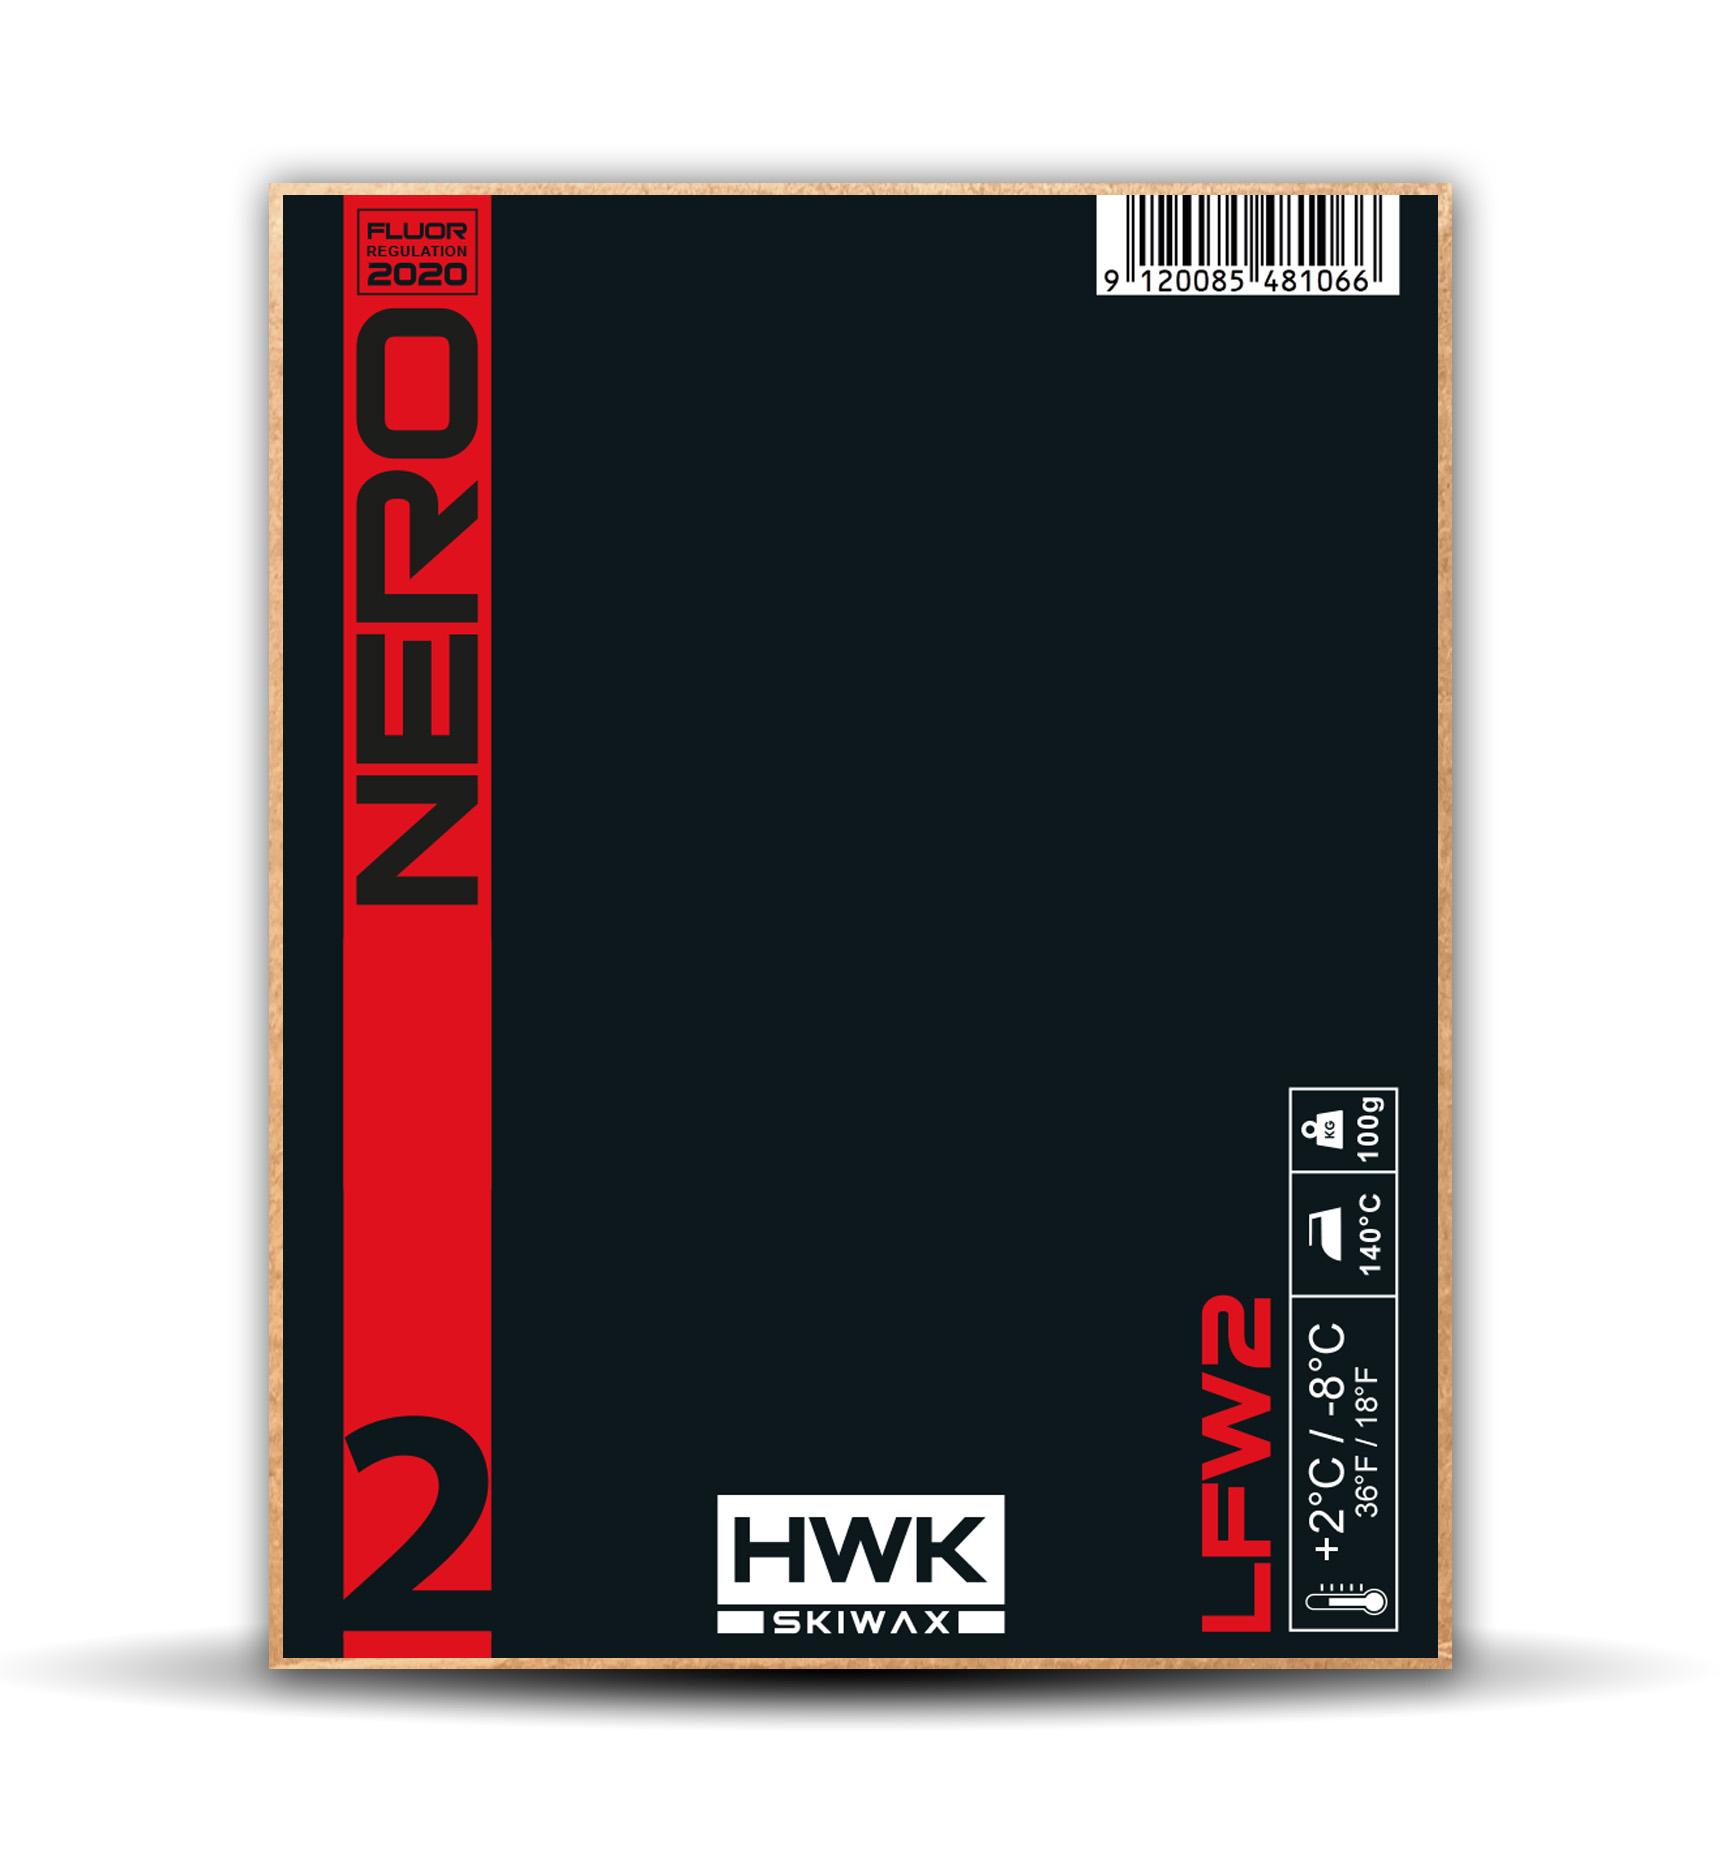 HWK LFW2 nero (K1nero)